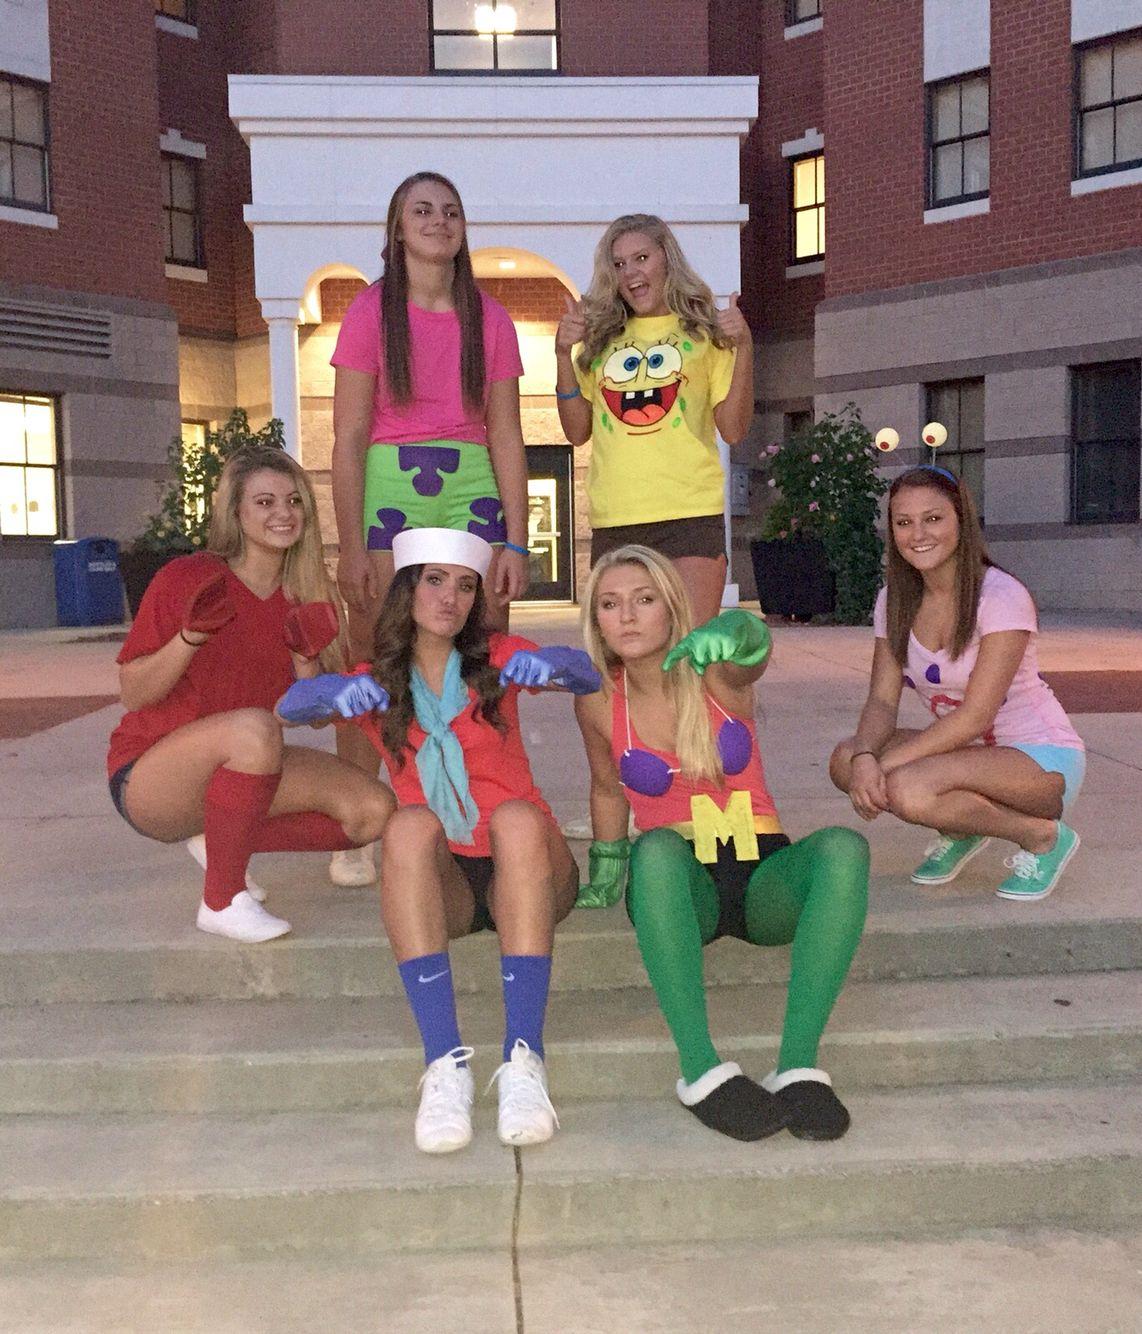 characters from spongebob squarepants! mr. krabs, pearl, ms. puff